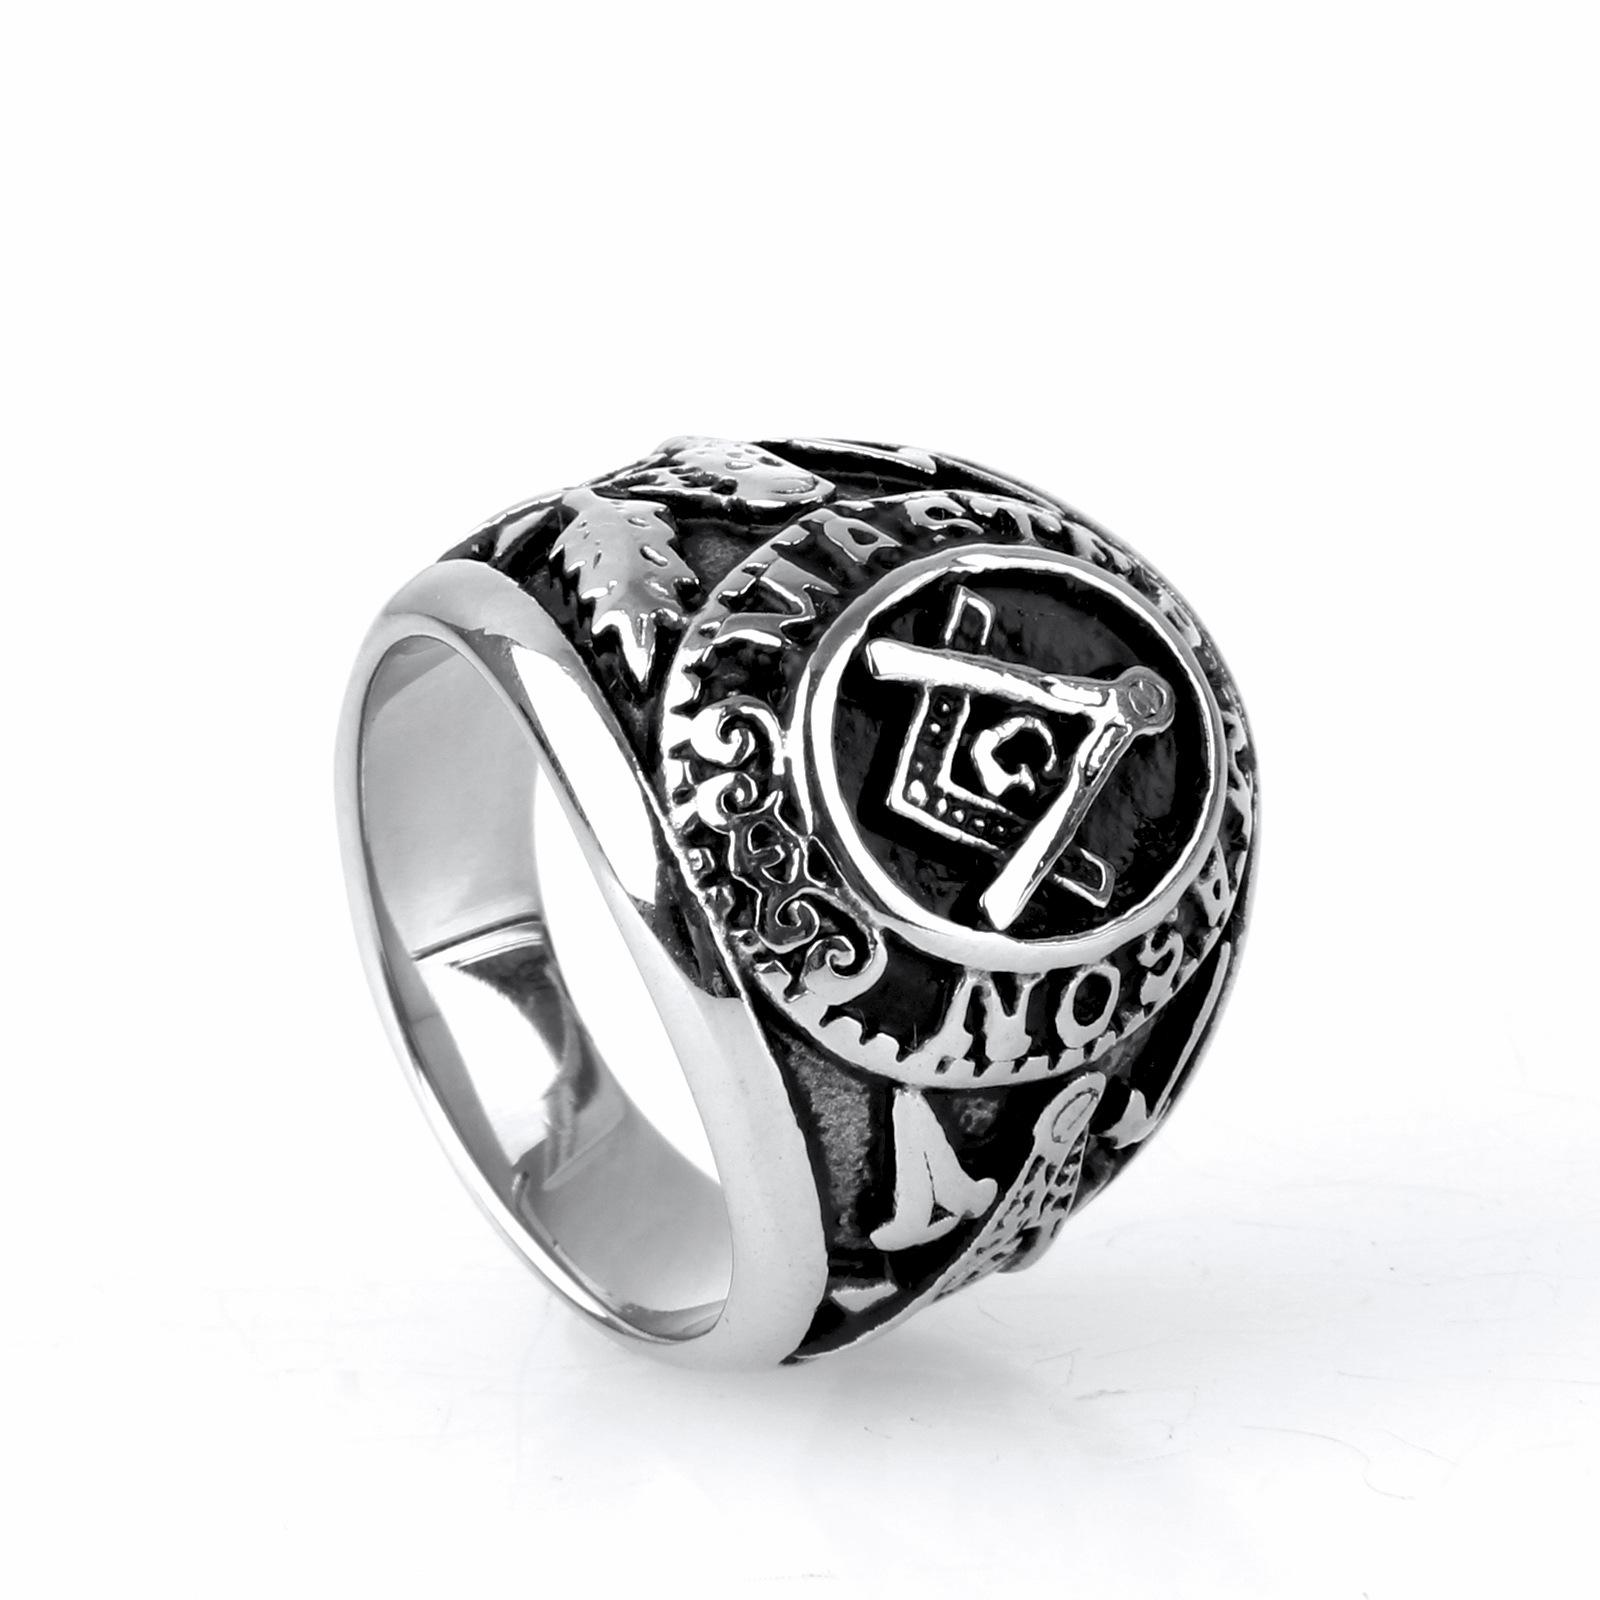 Manufacturers Selling Europe Stainless Steel Ring Men Jewelry Wholesale Retro Masonic Titanium Rd0079(China (Mainland))